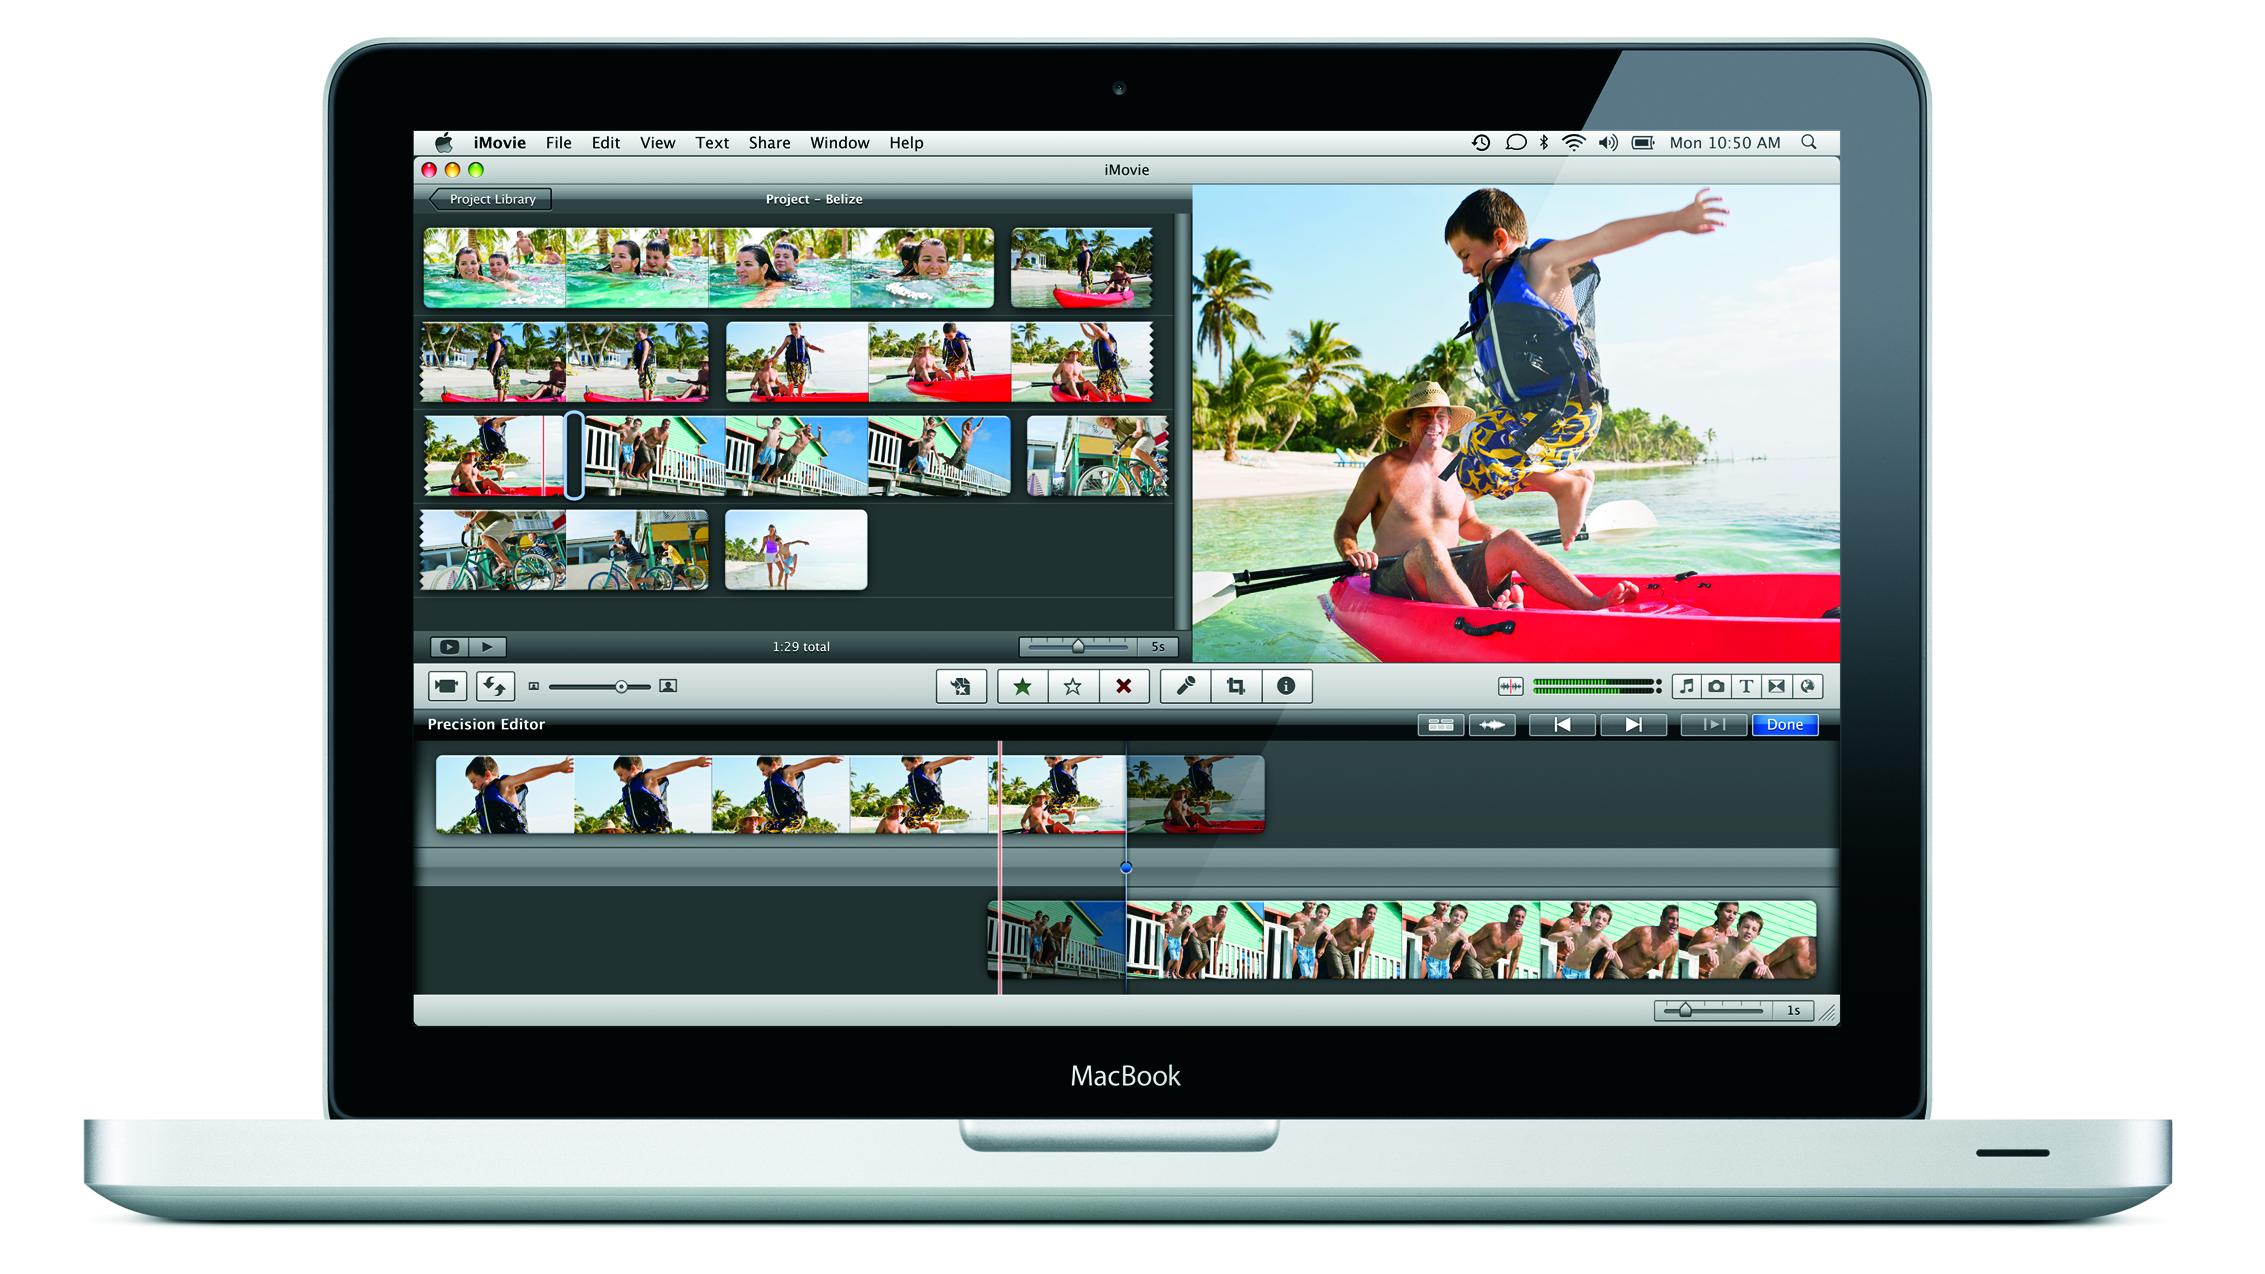 imovie for mac pro